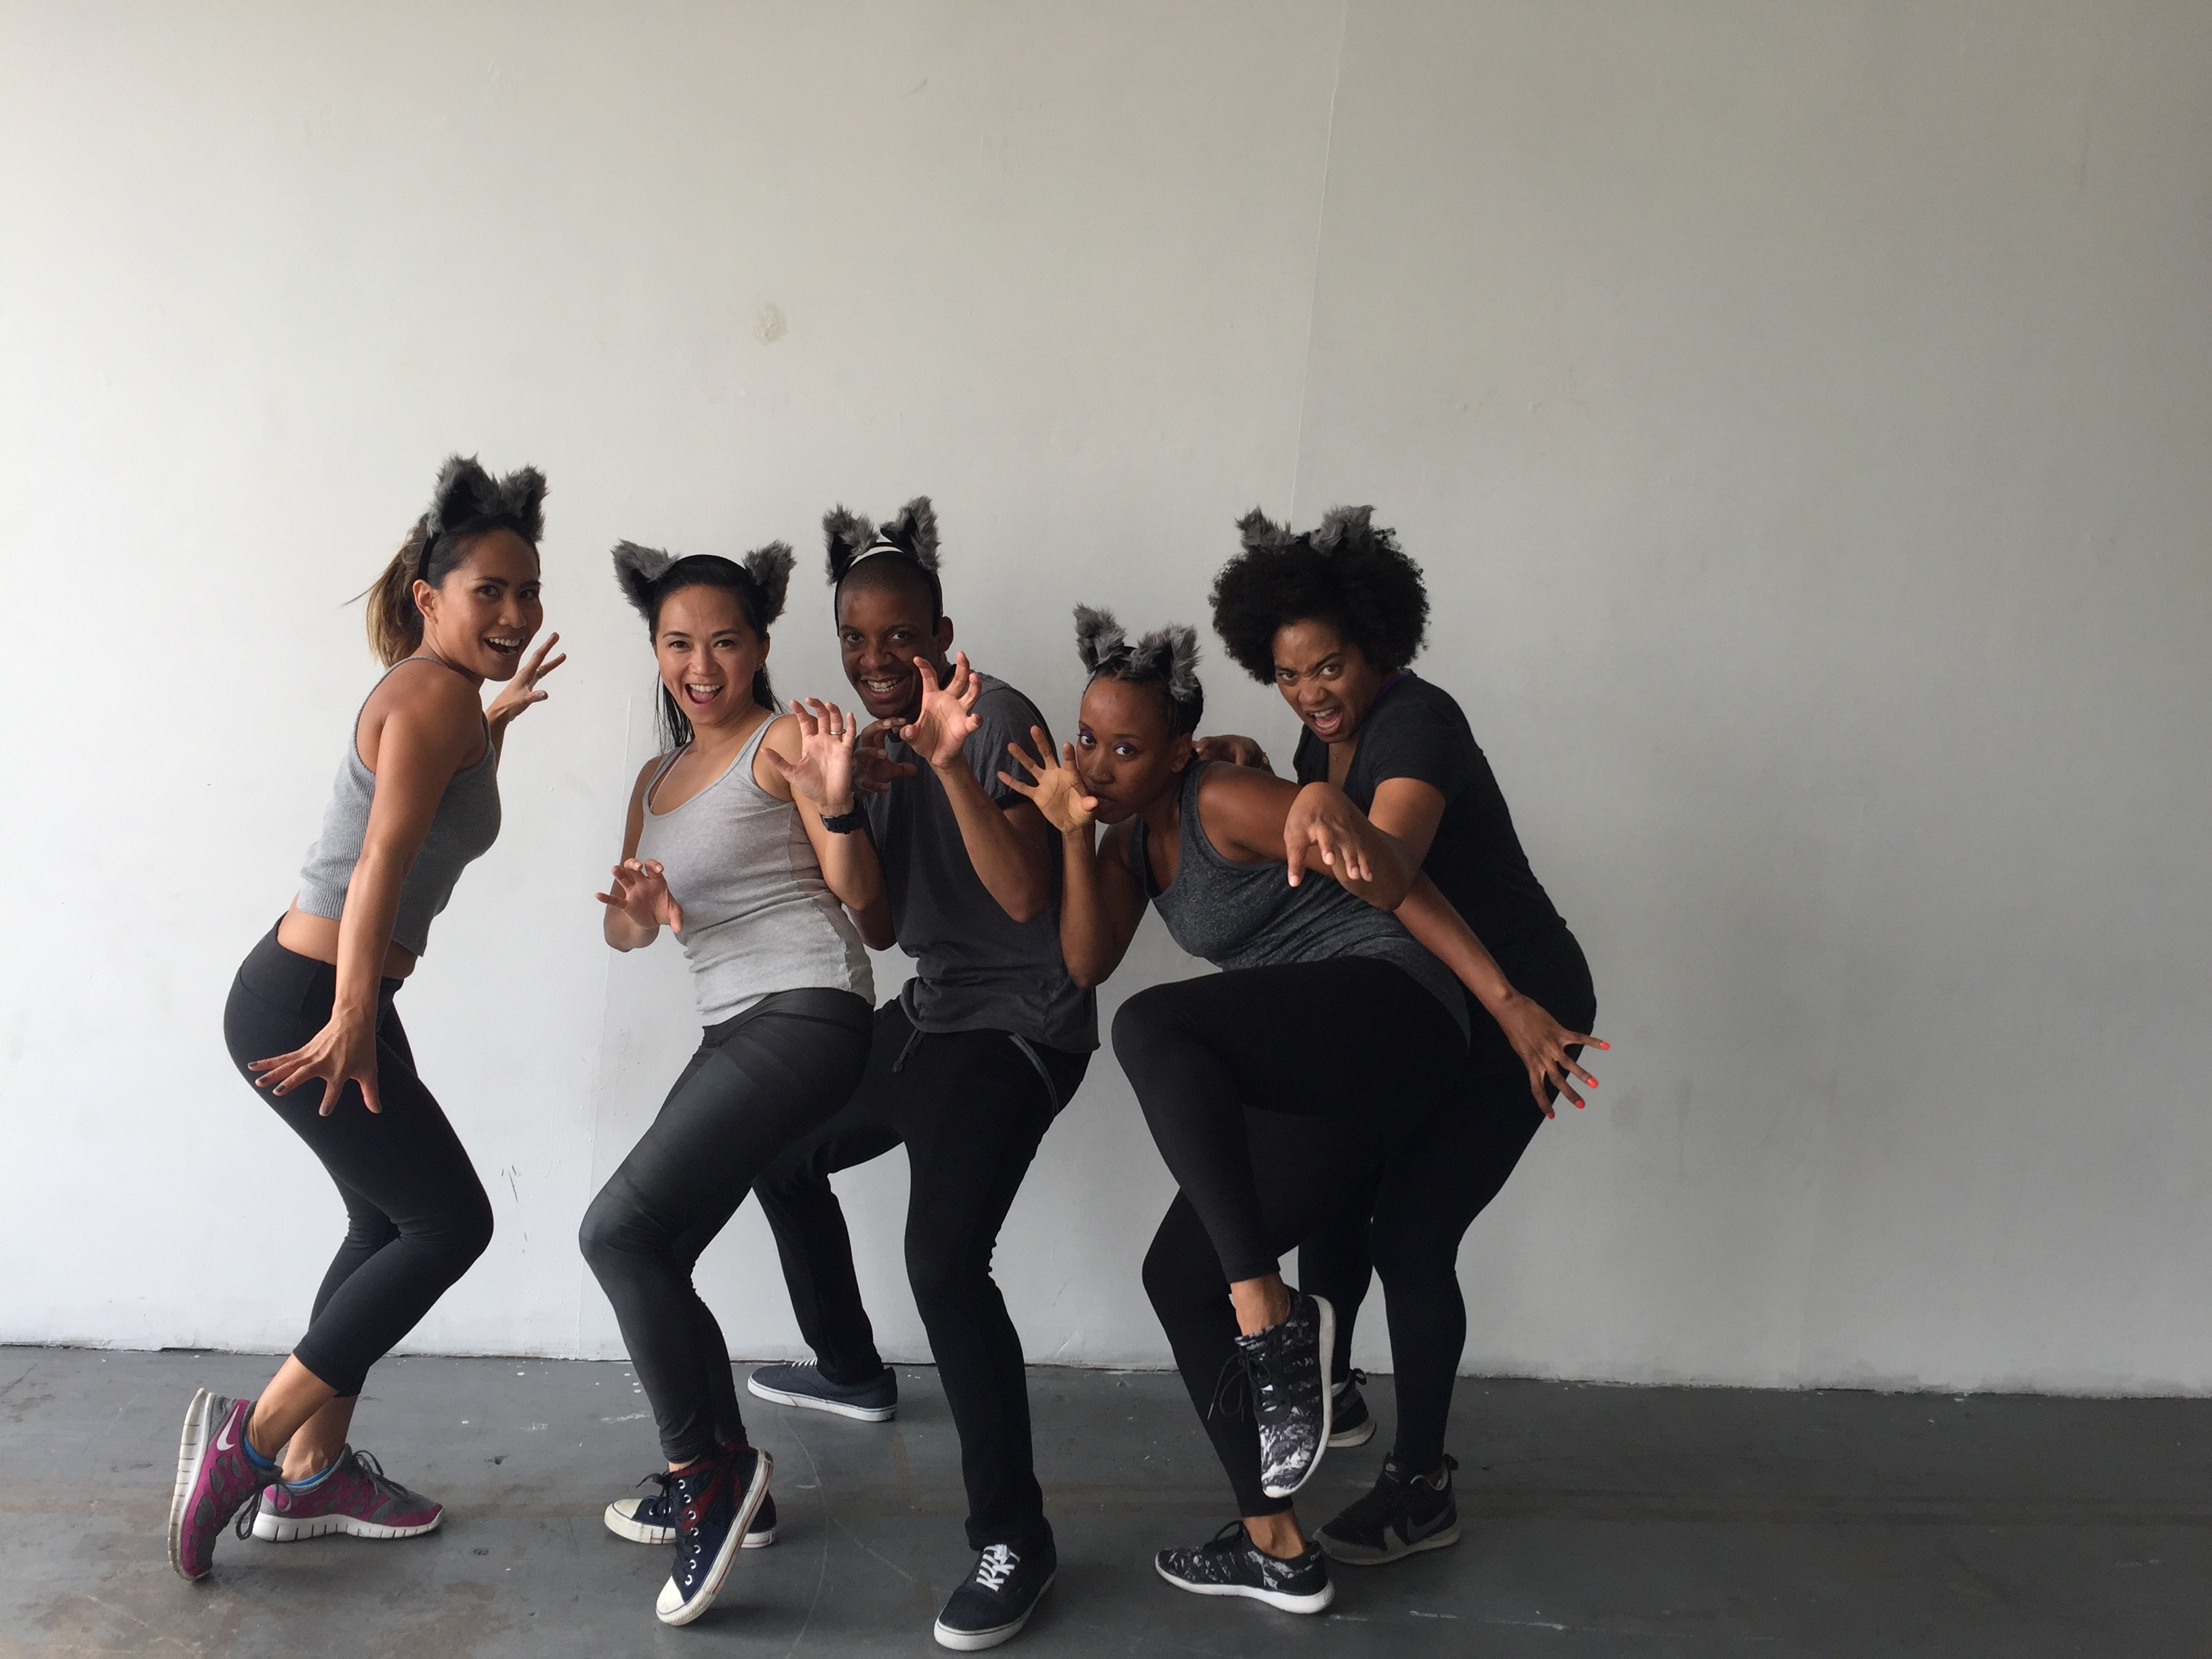 Shewolf Danehall Jam workout